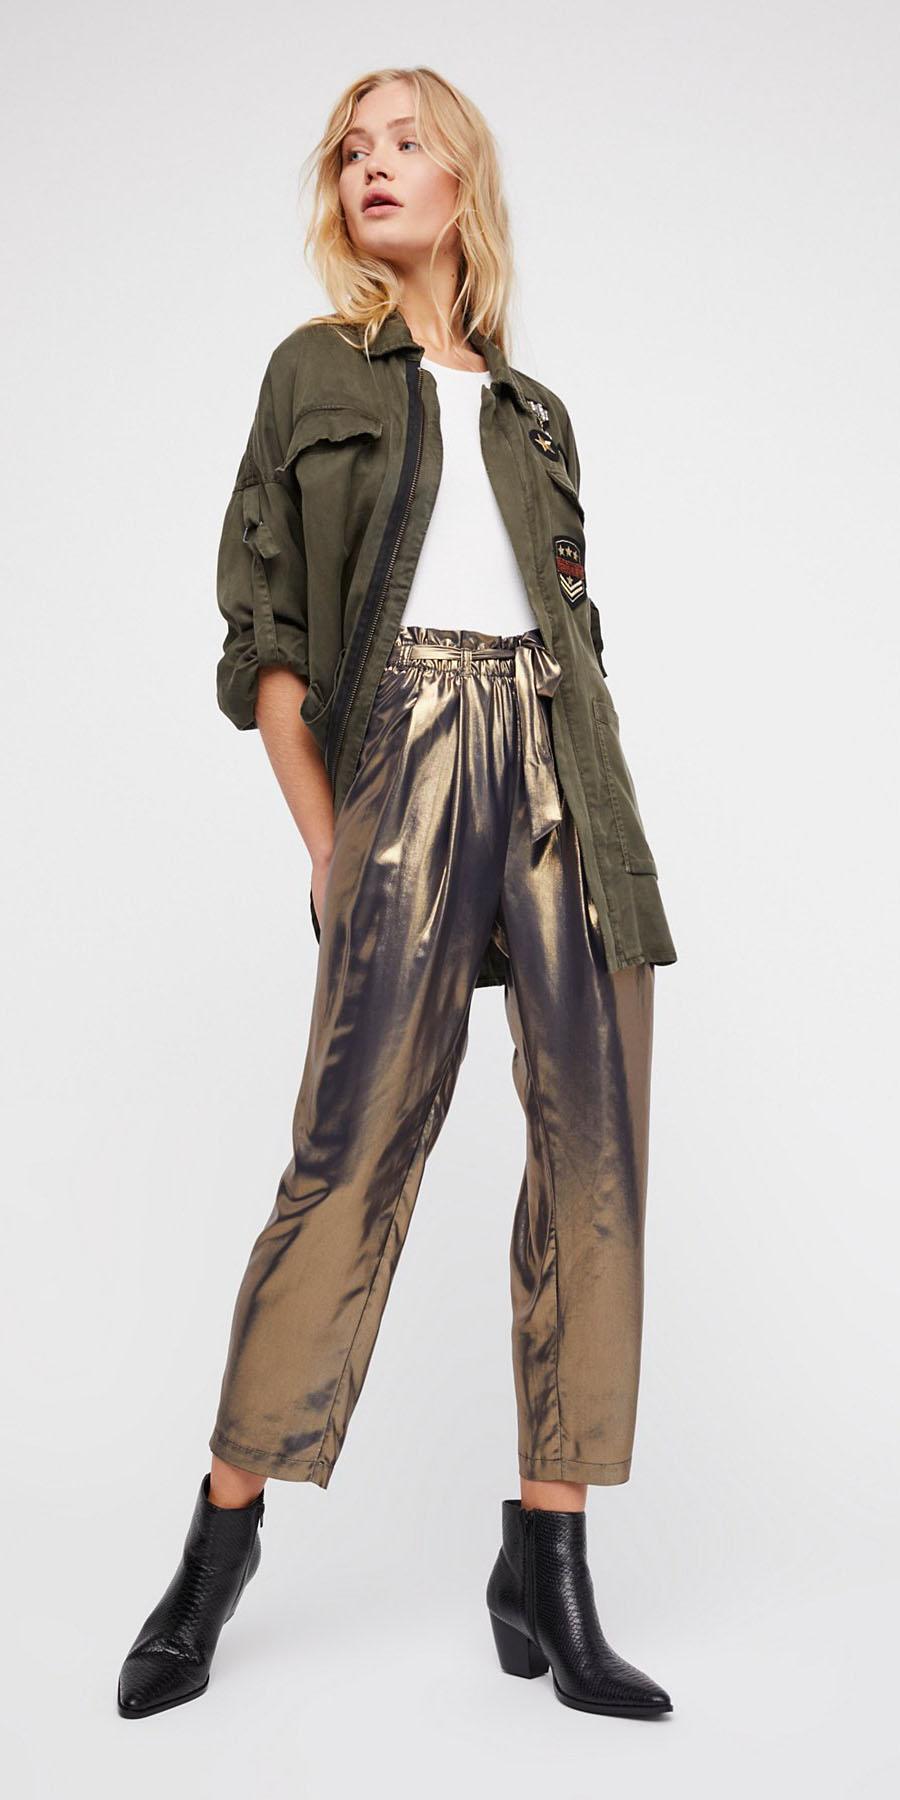 tan-joggers-pants-gold-white-tee-green-olive-jacket-utility-blonde-black-shoe-booties-metallic-fall-winter-lunch.jpg